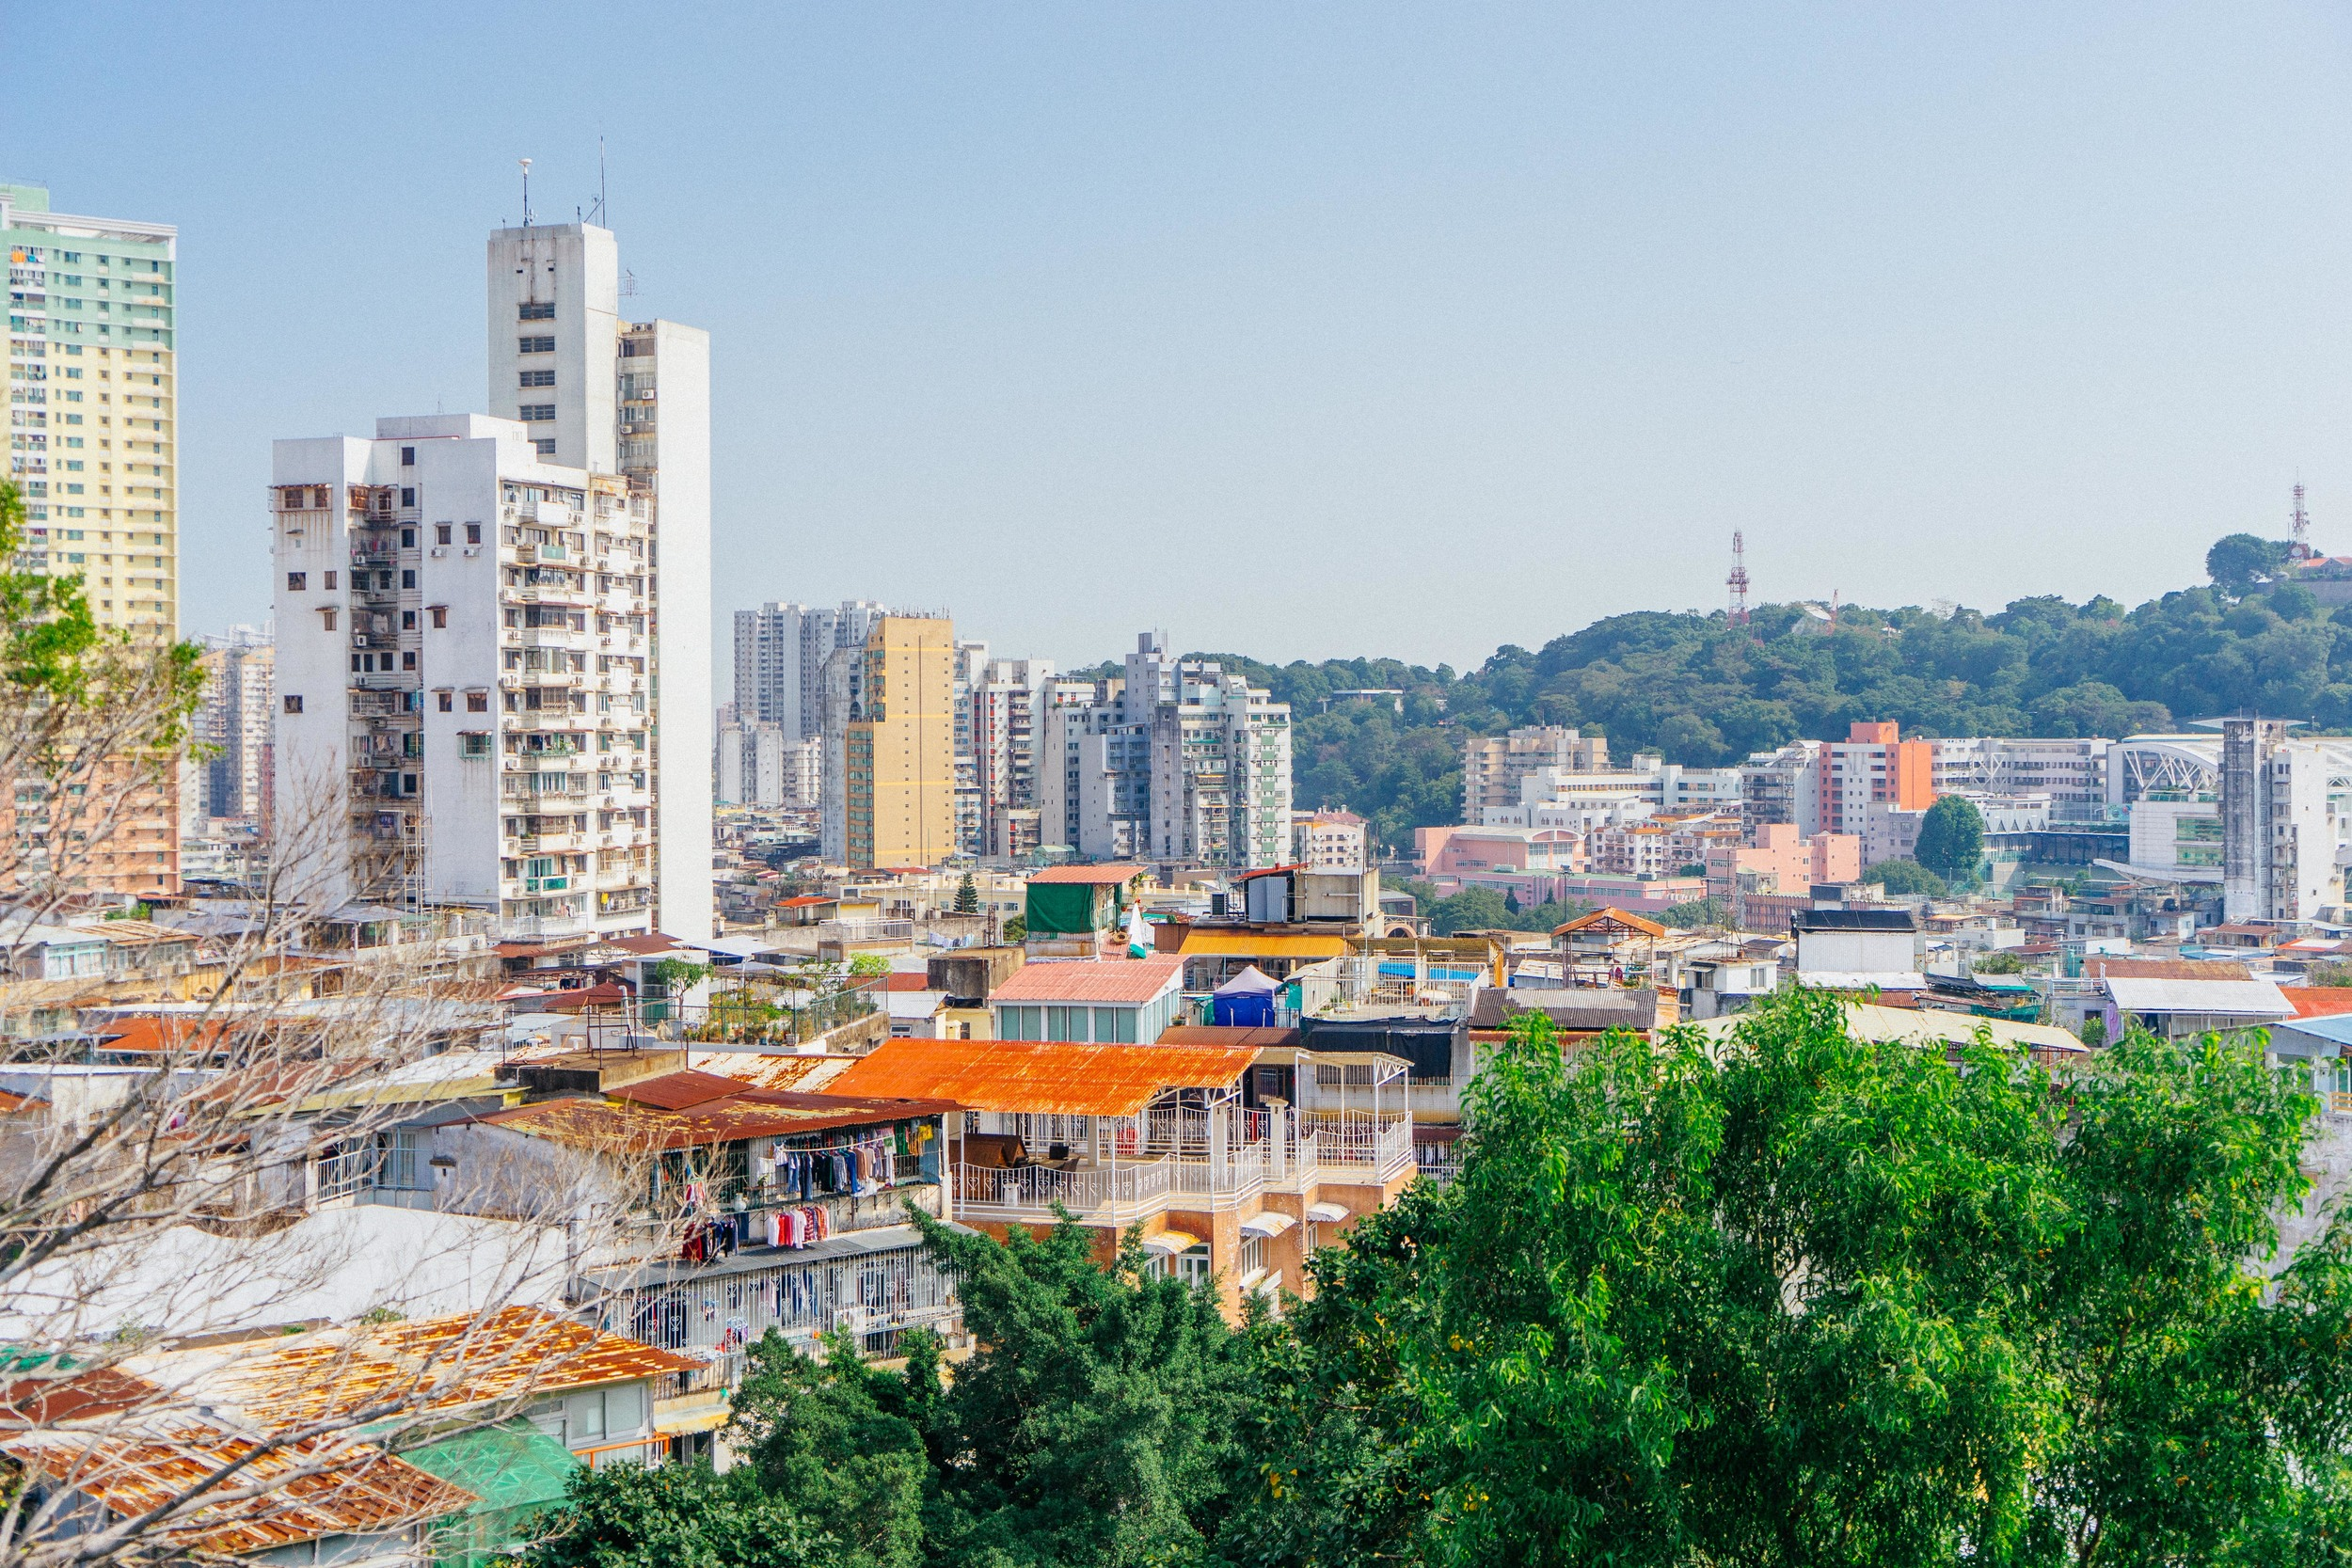 Macau Skyline (3/3)